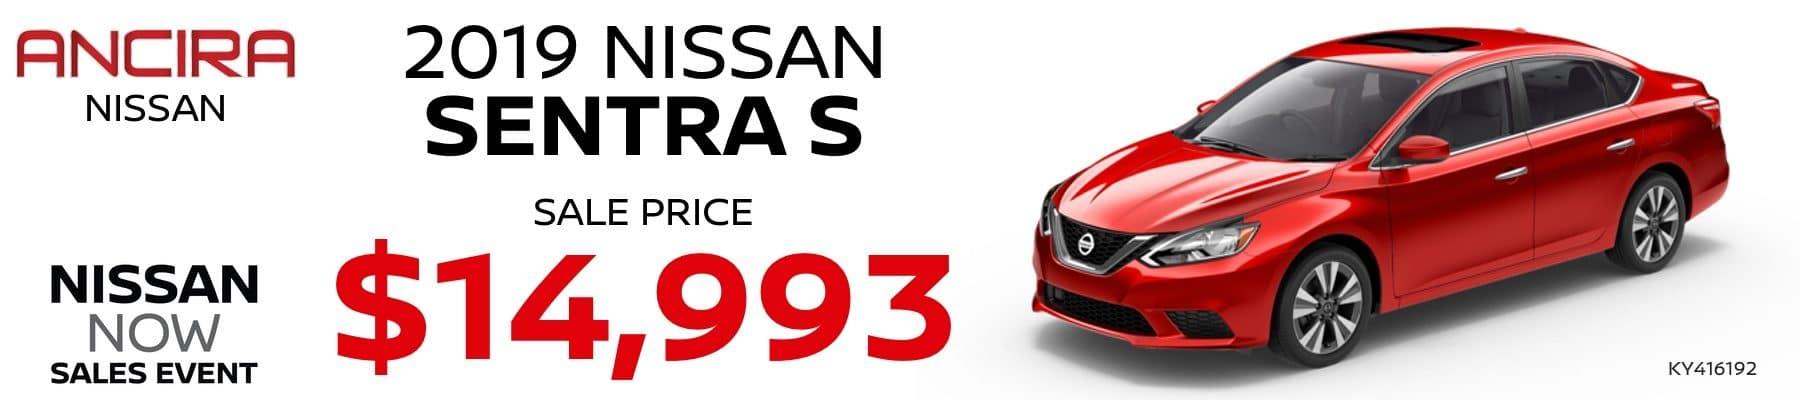 2019 Nissan Sentra - Ancira Nissan San Antonio, TX